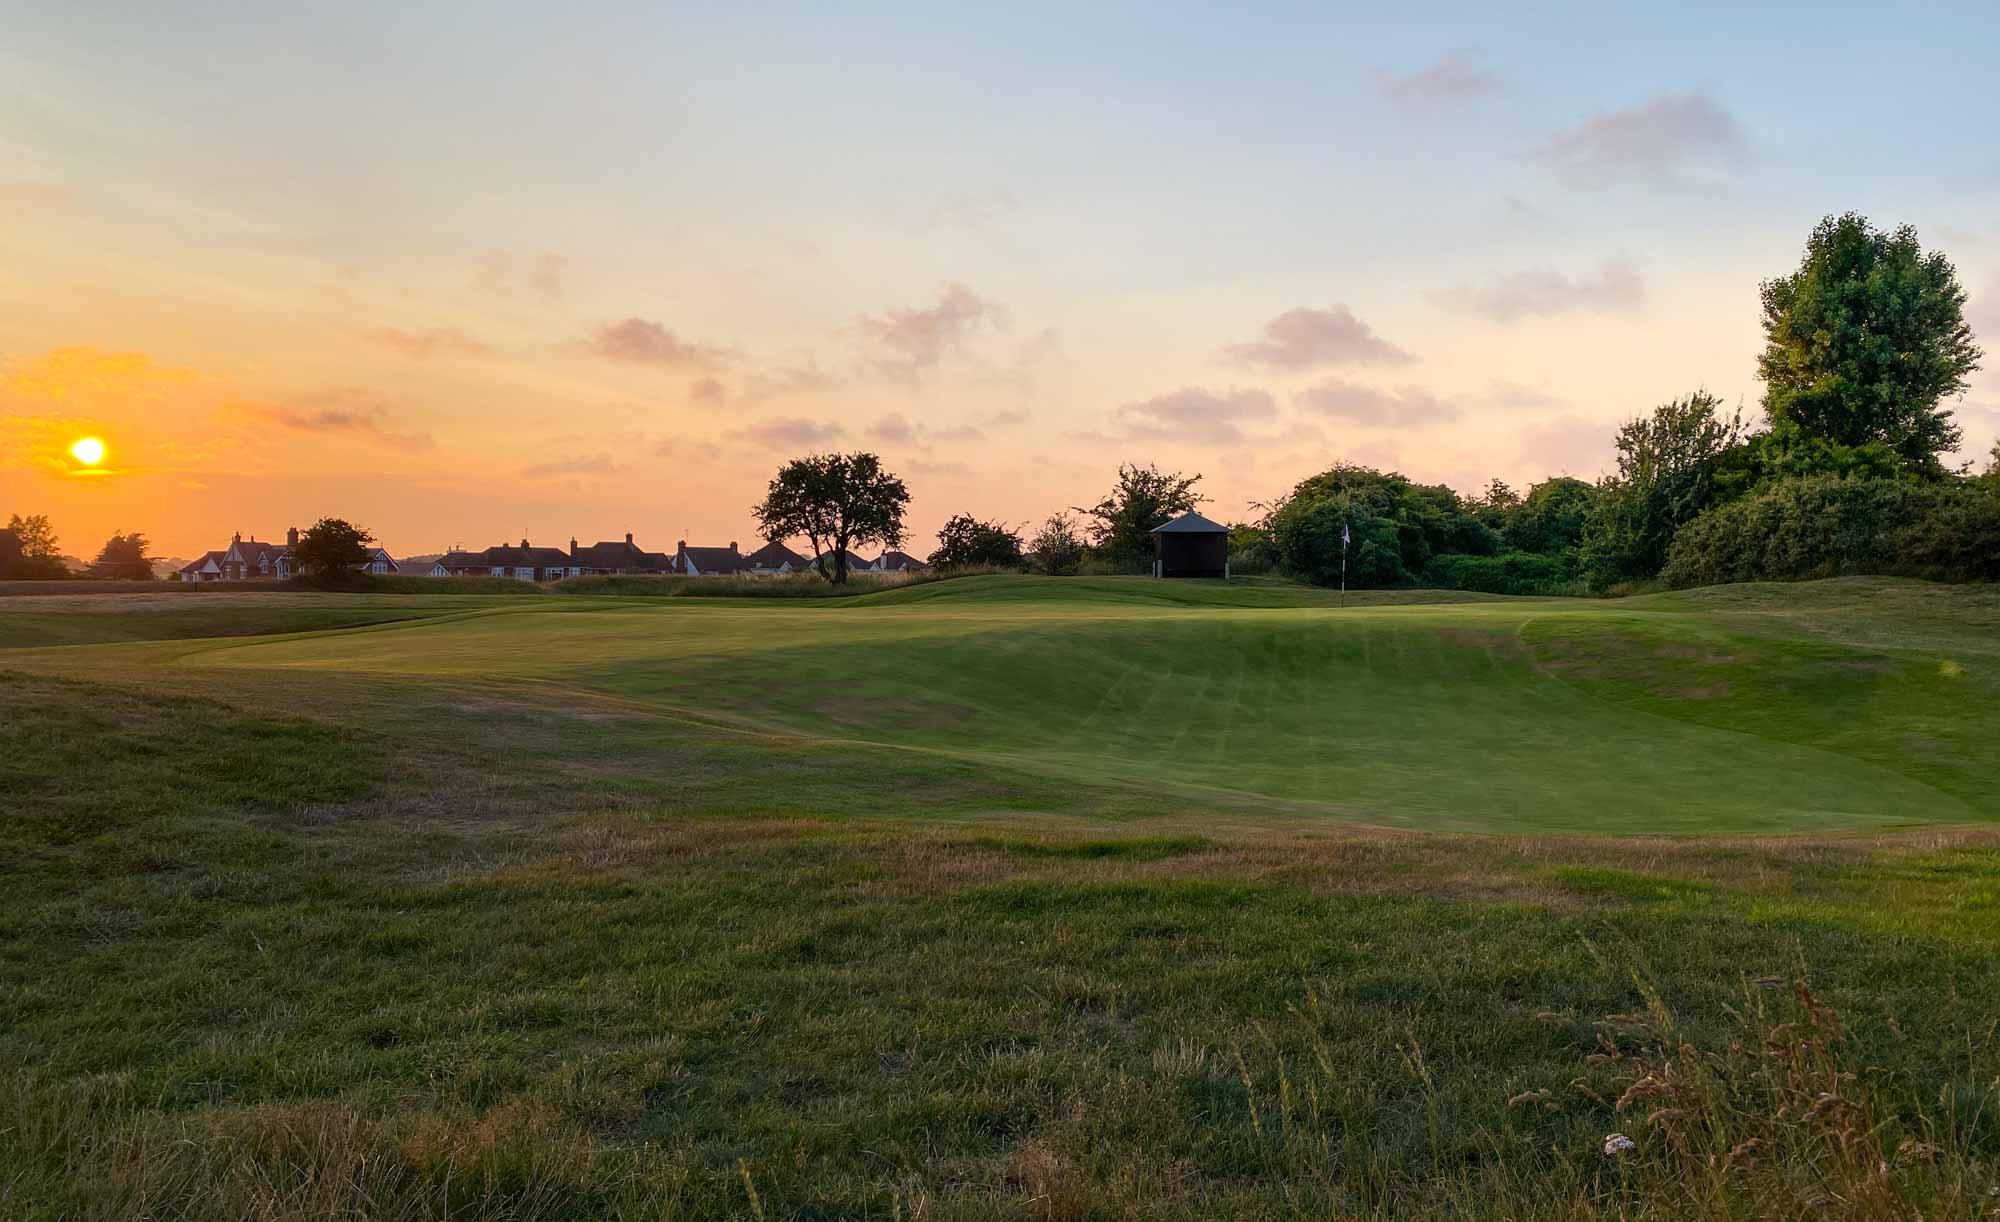 Seacroft Golf Club 16th Green Punchbowl